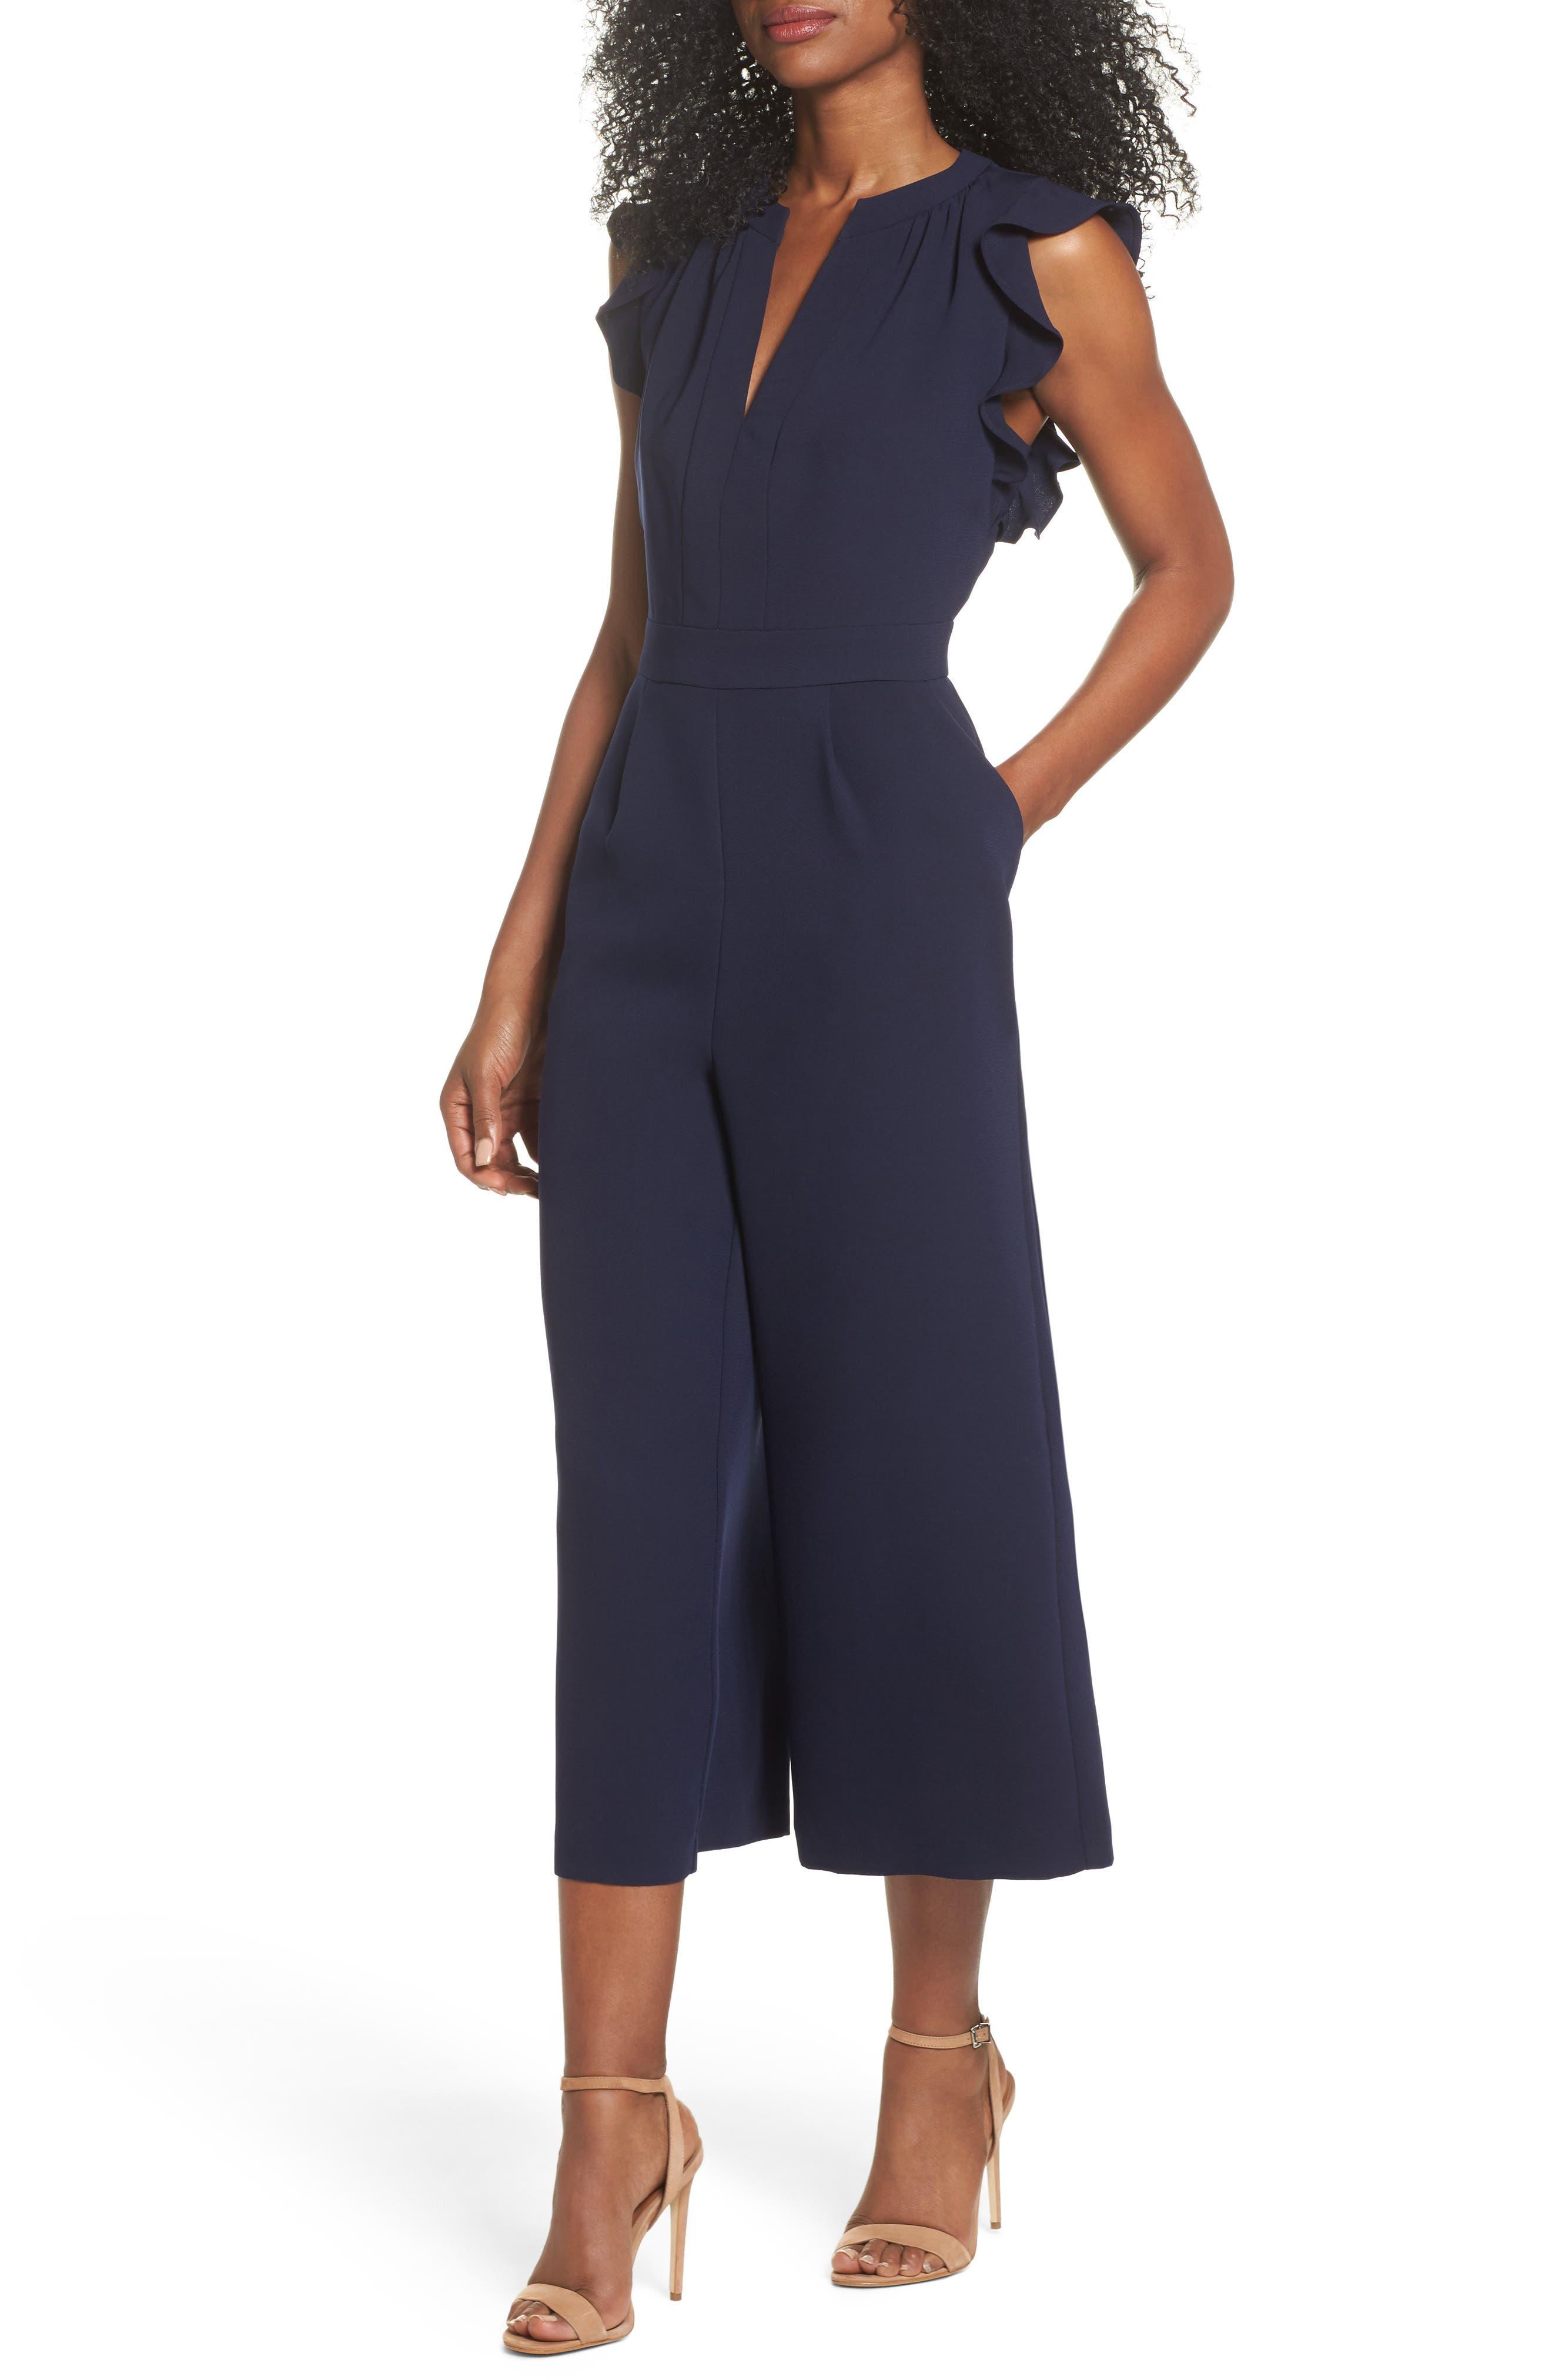 VINCE CAMUTO, Ruffle Wide Leg Crop Jumpsuit, Main thumbnail 1, color, NAVY